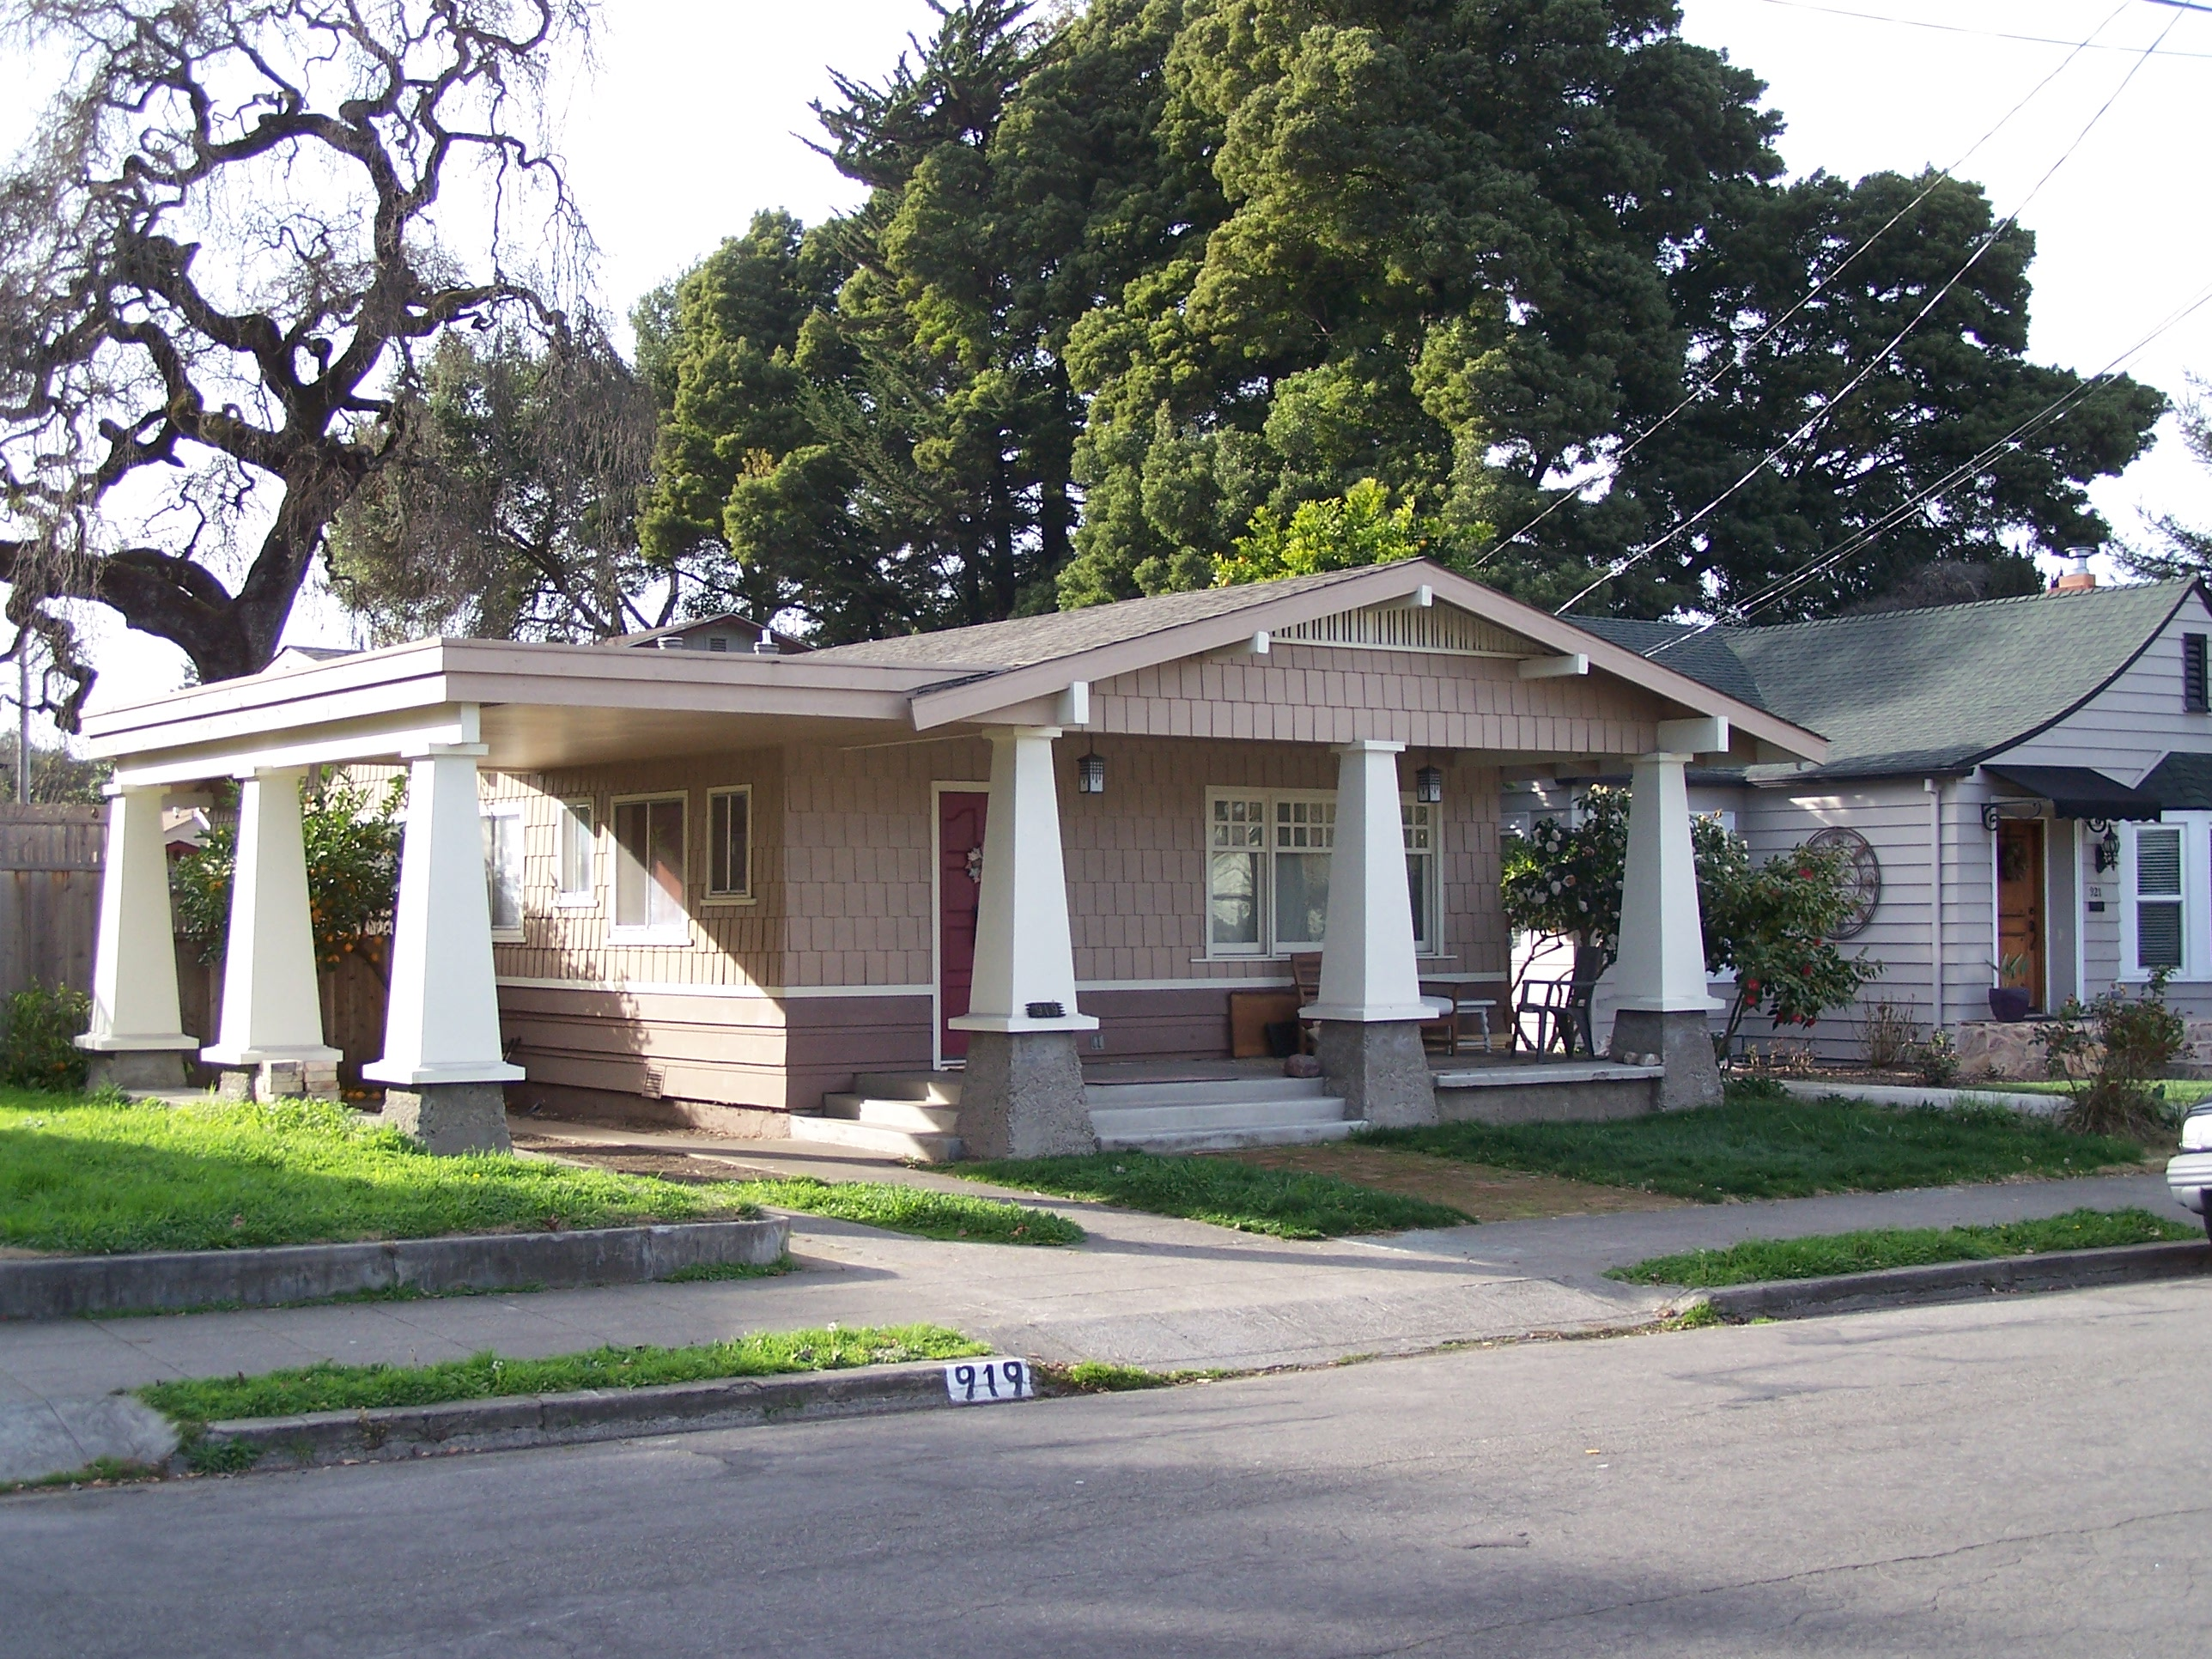 Washington Street - 919